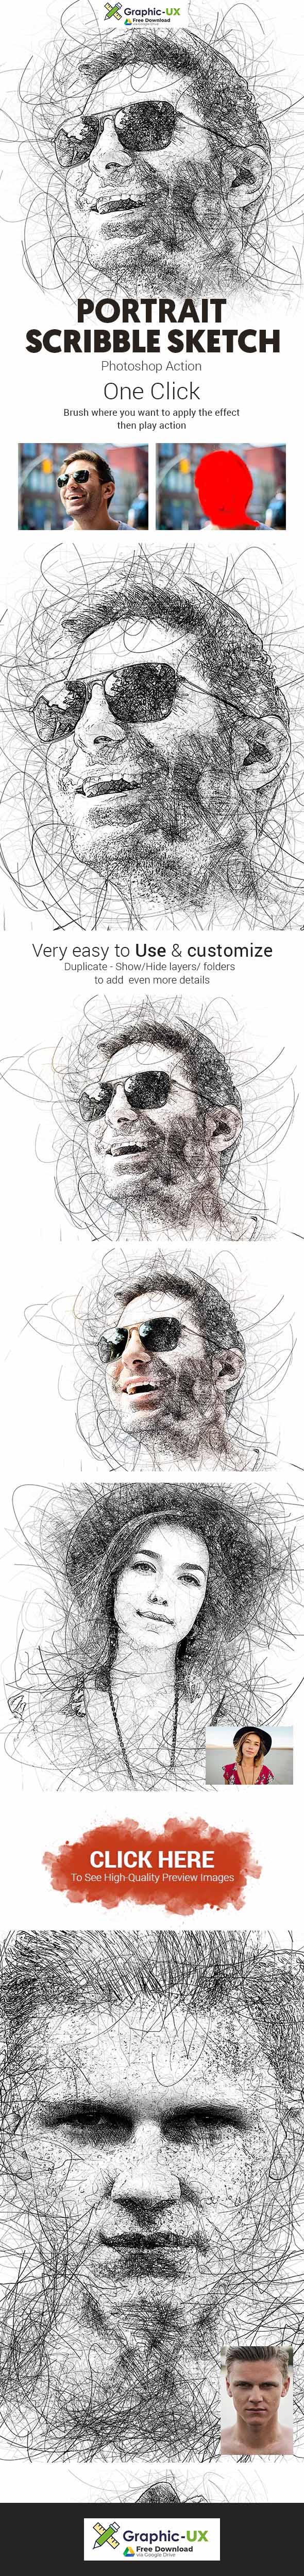 Portrait Scribble Sketch Art Photoshop Action free download